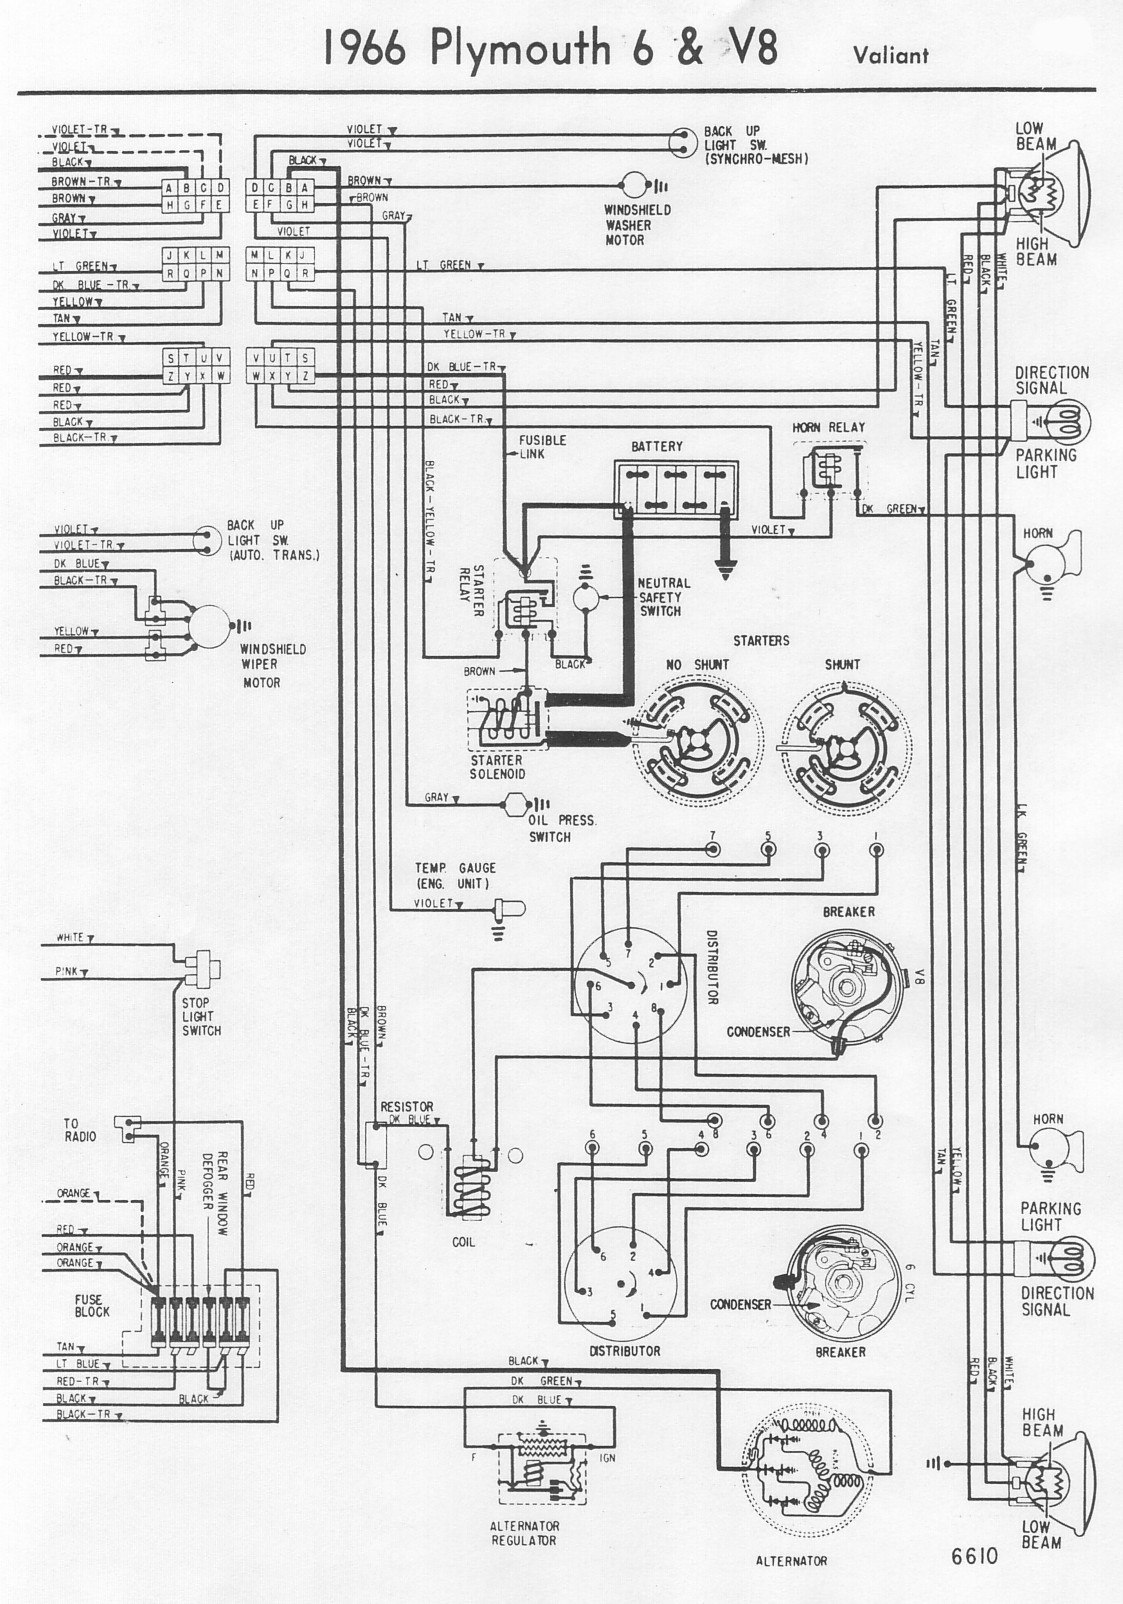 66ValiantB?quality\\=80\\&strip\\=all 1976 suzuki dr 250 wiring diagram suzuki gsx 750 wiring diagram ttr 250 wiring diagram at readyjetset.co